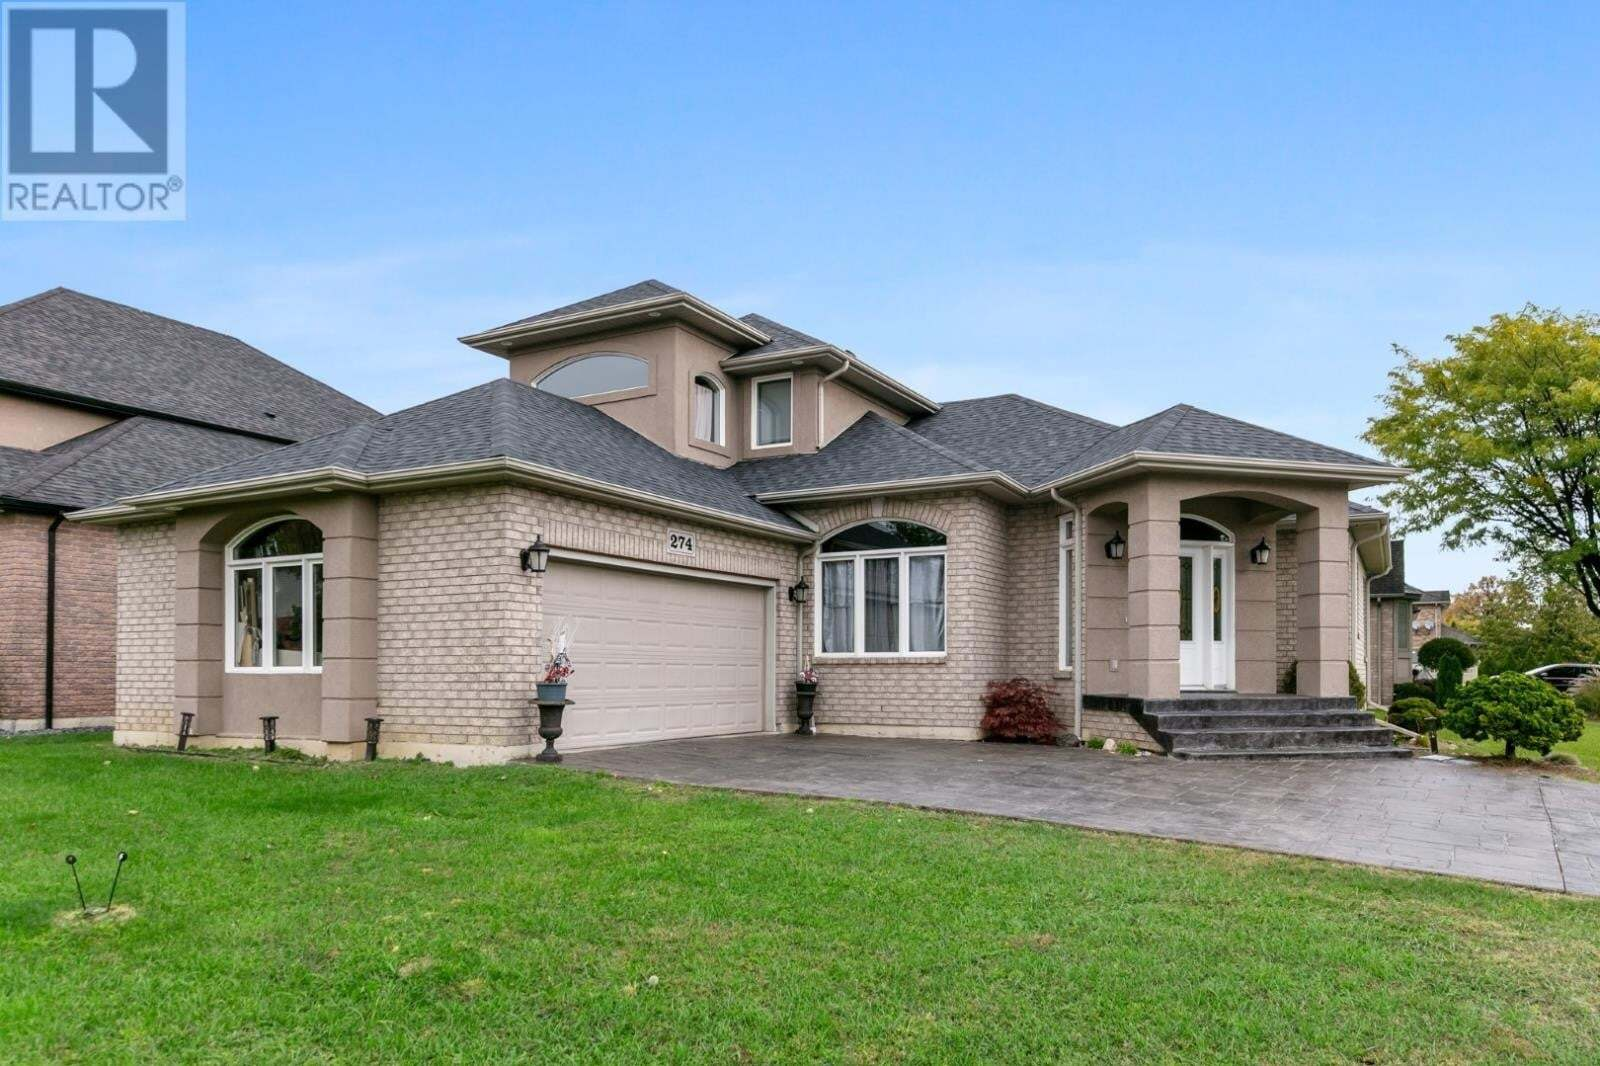 House for sale at 274 Moceri  Lakeshore Ontario - MLS: 20007800